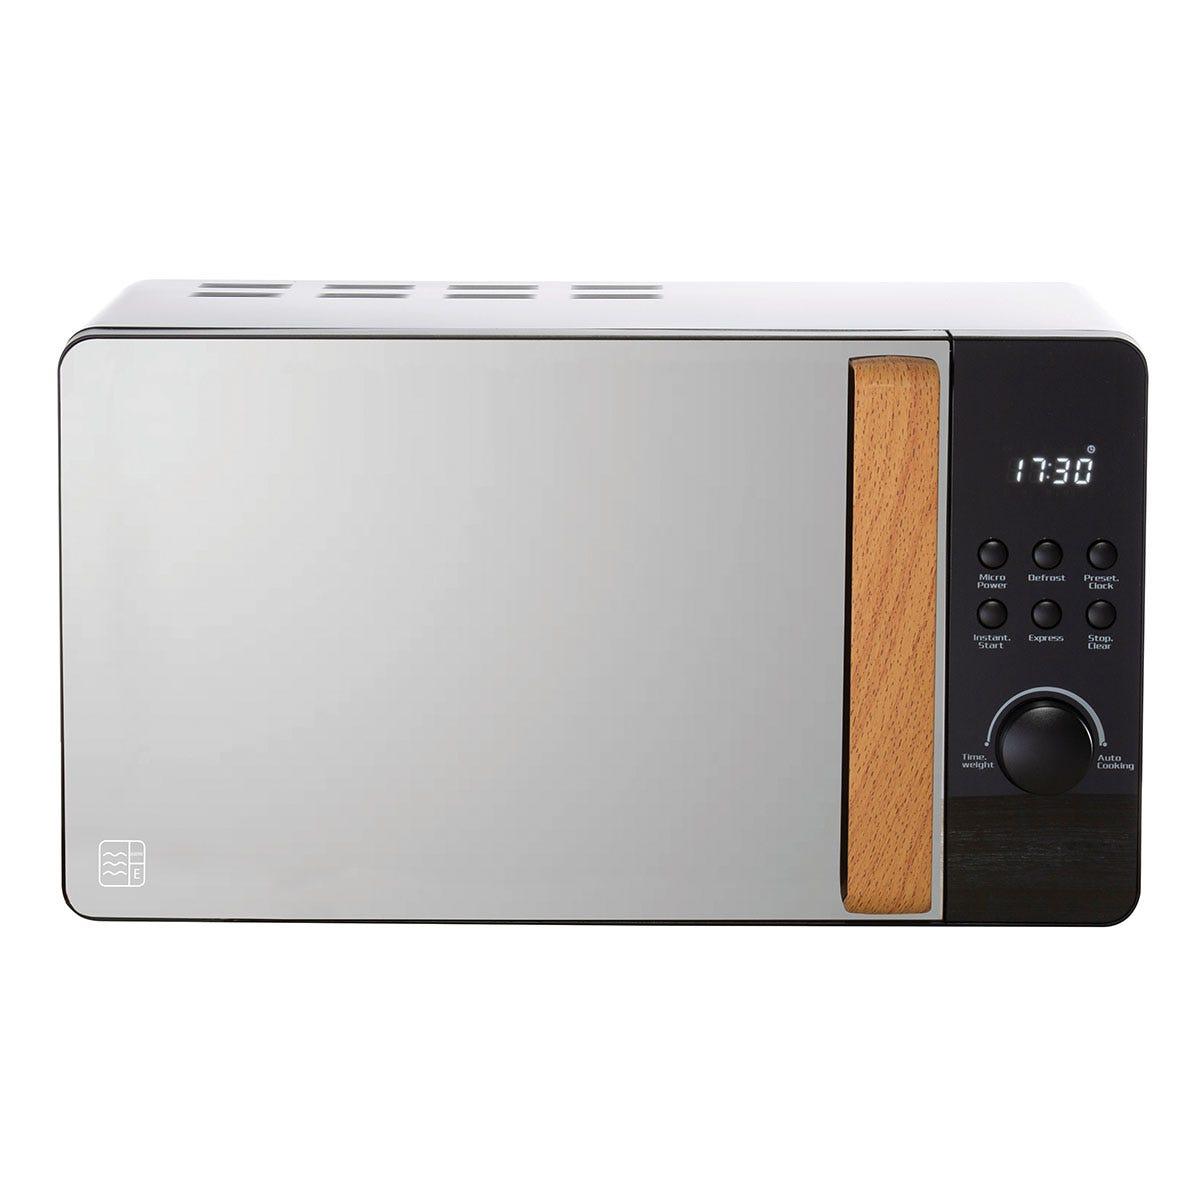 Daewoo SDA1698 Skandik 800W 20L Wooden Handle Digital Microwave - Black